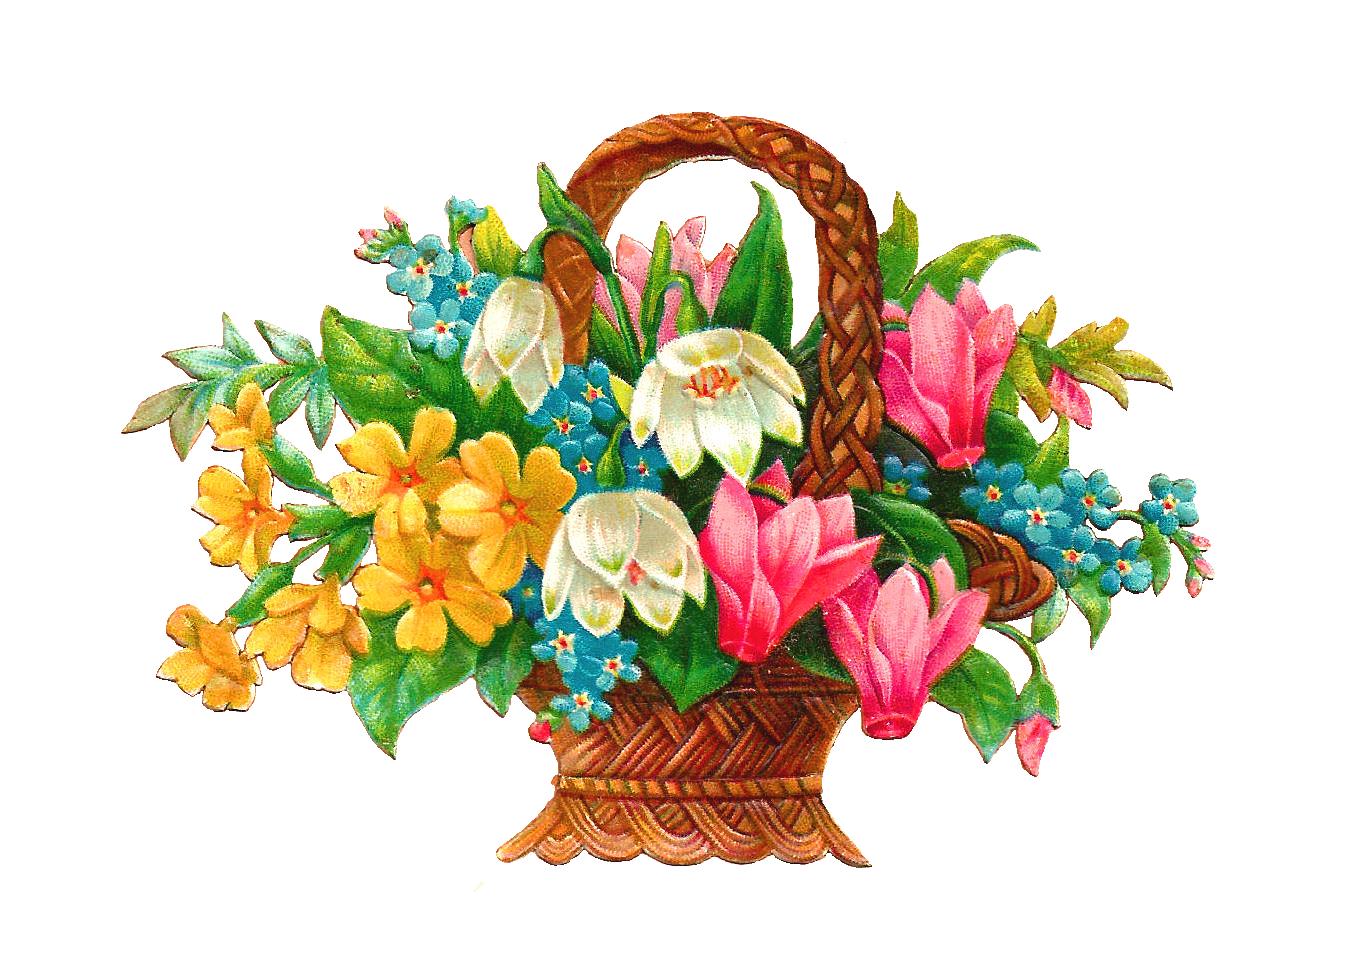 Antique images free flower basket clip art 2 wicket baskets full antique images free flower basket clip art 2 wicket baskets full dhlflorist Image collections